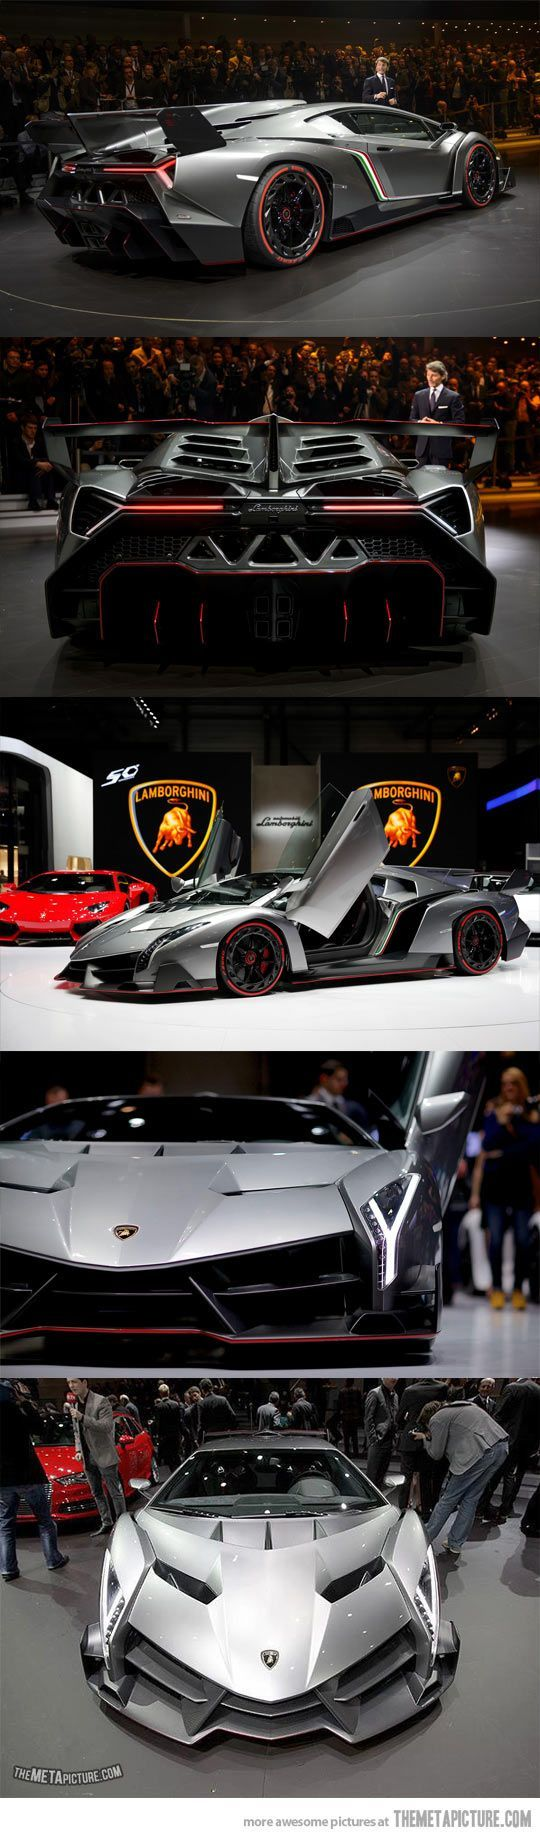 lamborghini veneno only 3 were made in the world carros esportivos cle patra e esportivo. Black Bedroom Furniture Sets. Home Design Ideas